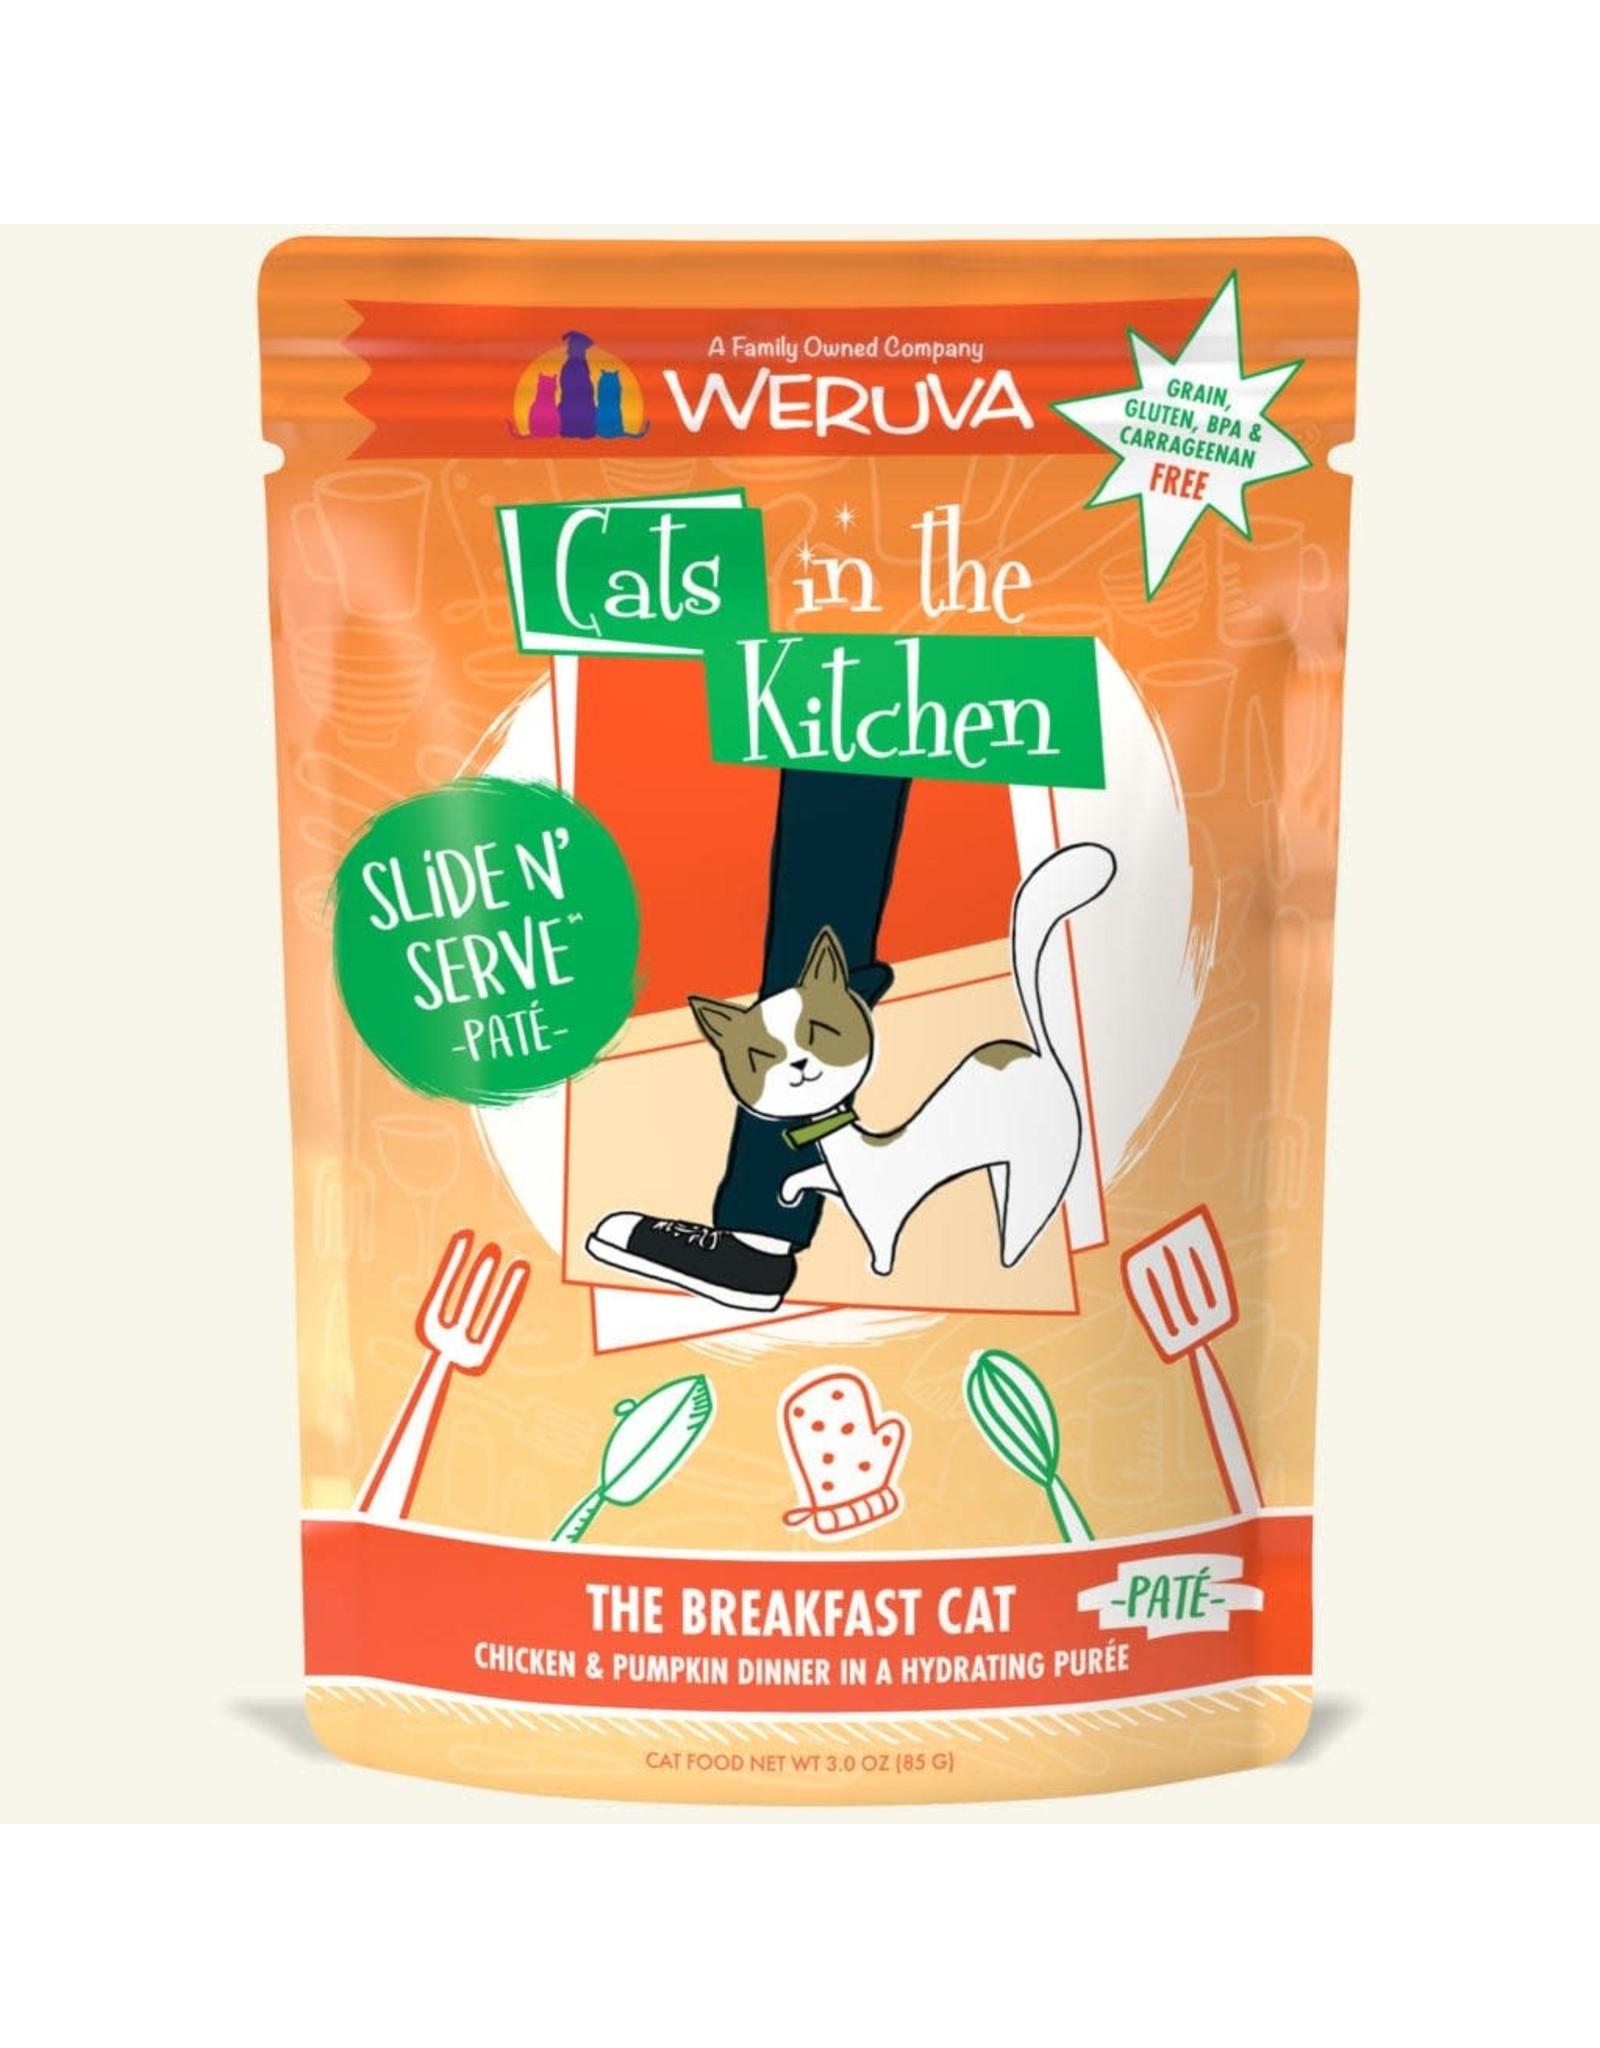 Weruva CITK Pouch - THE BREAKFAST CAT 3oz